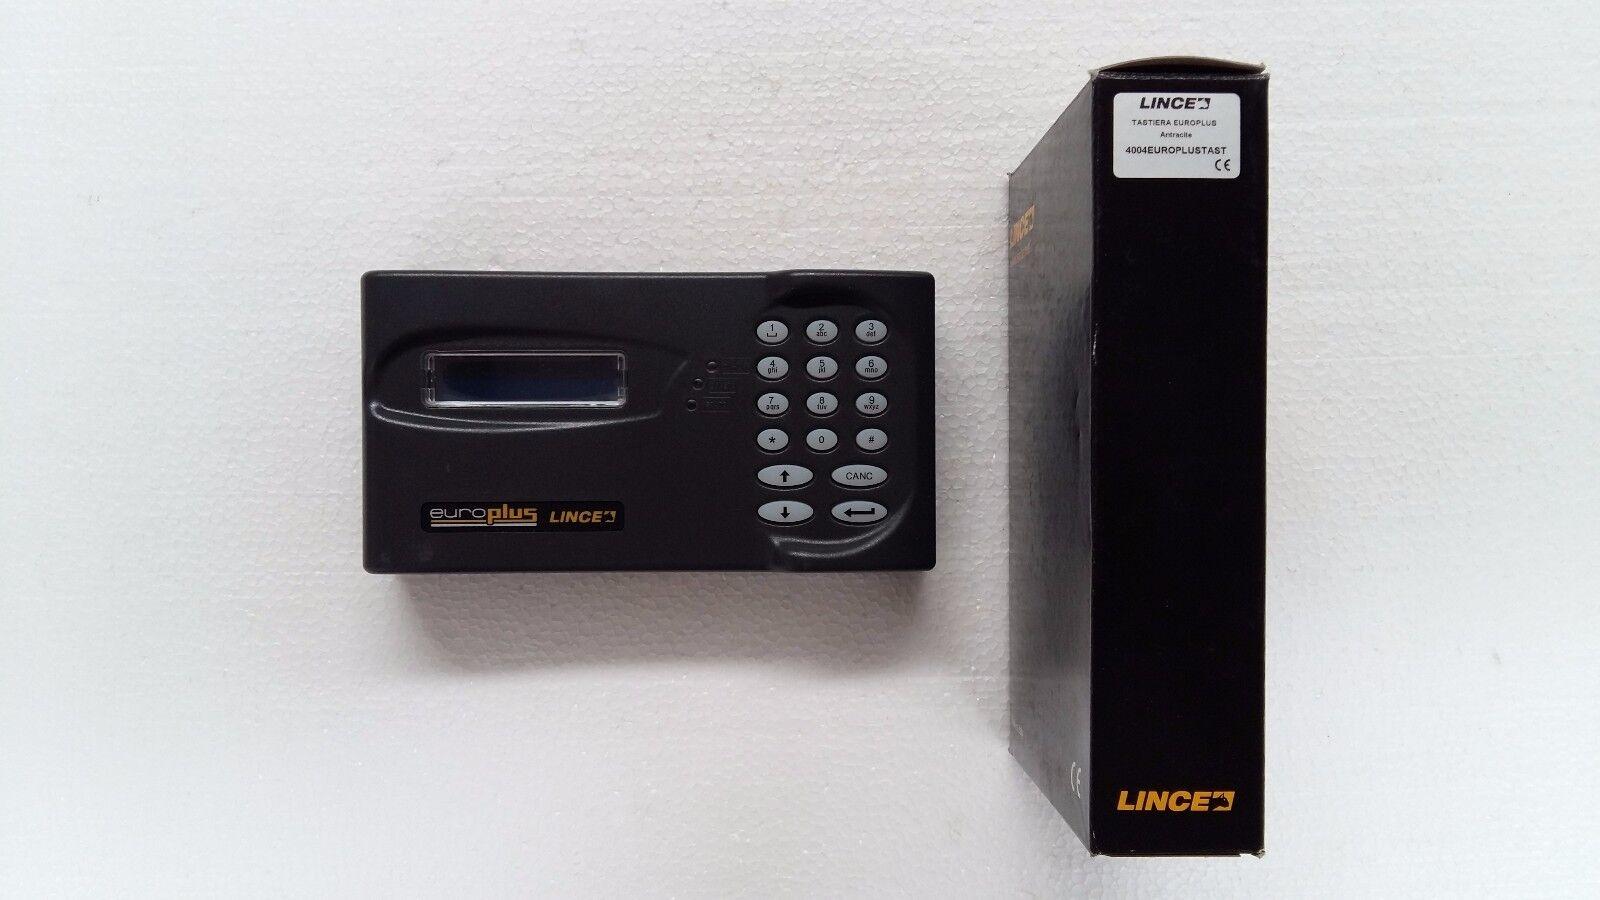 LINCE 4004 EUROPLUSTAST tastiera display LCD antracite per EUROPLUS e GR868